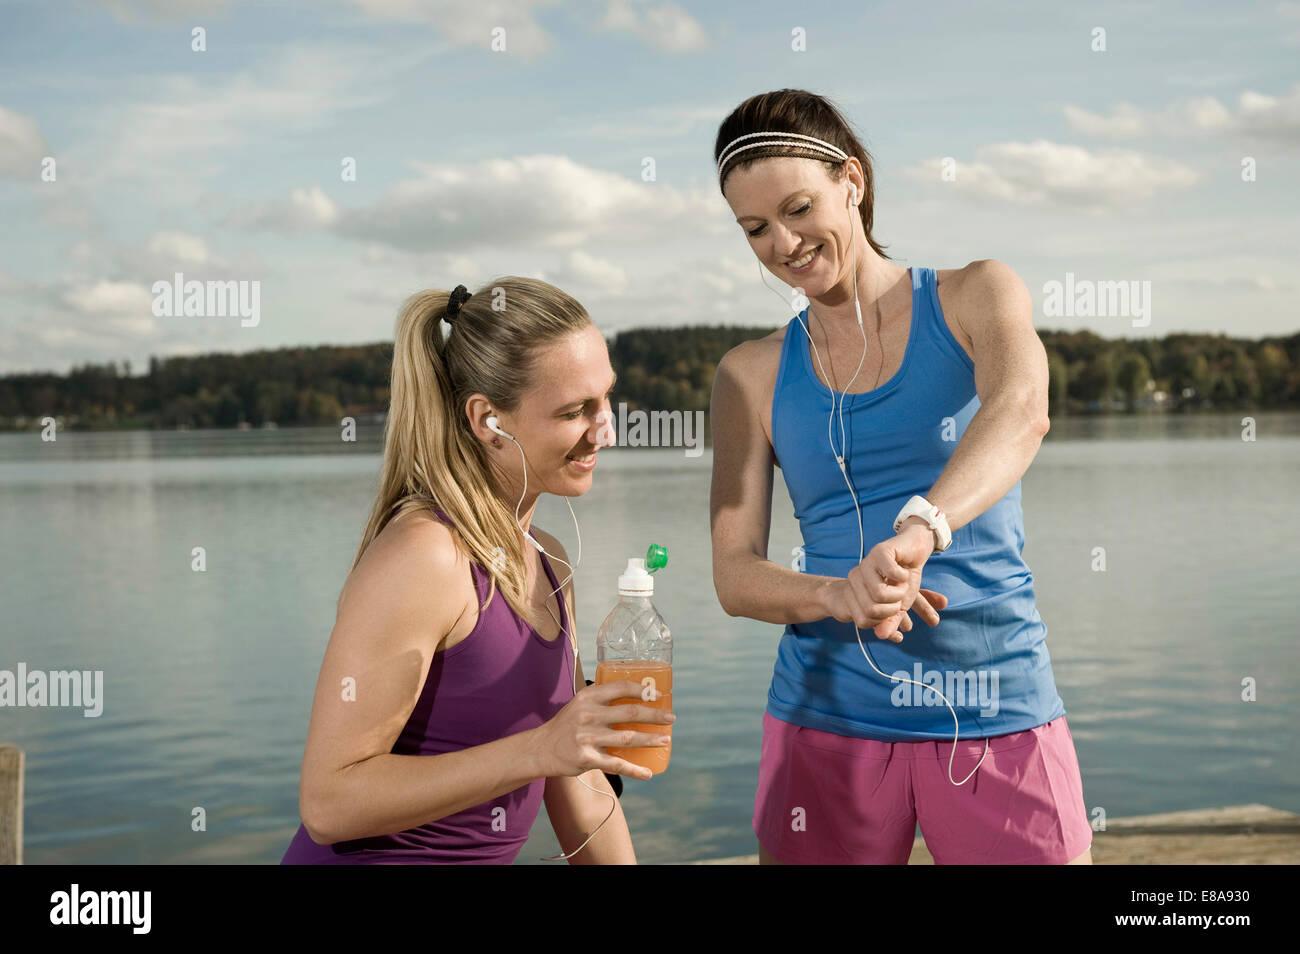 Jogging women taking a break, Woerthsee, Bavaria, Germany - Stock Image